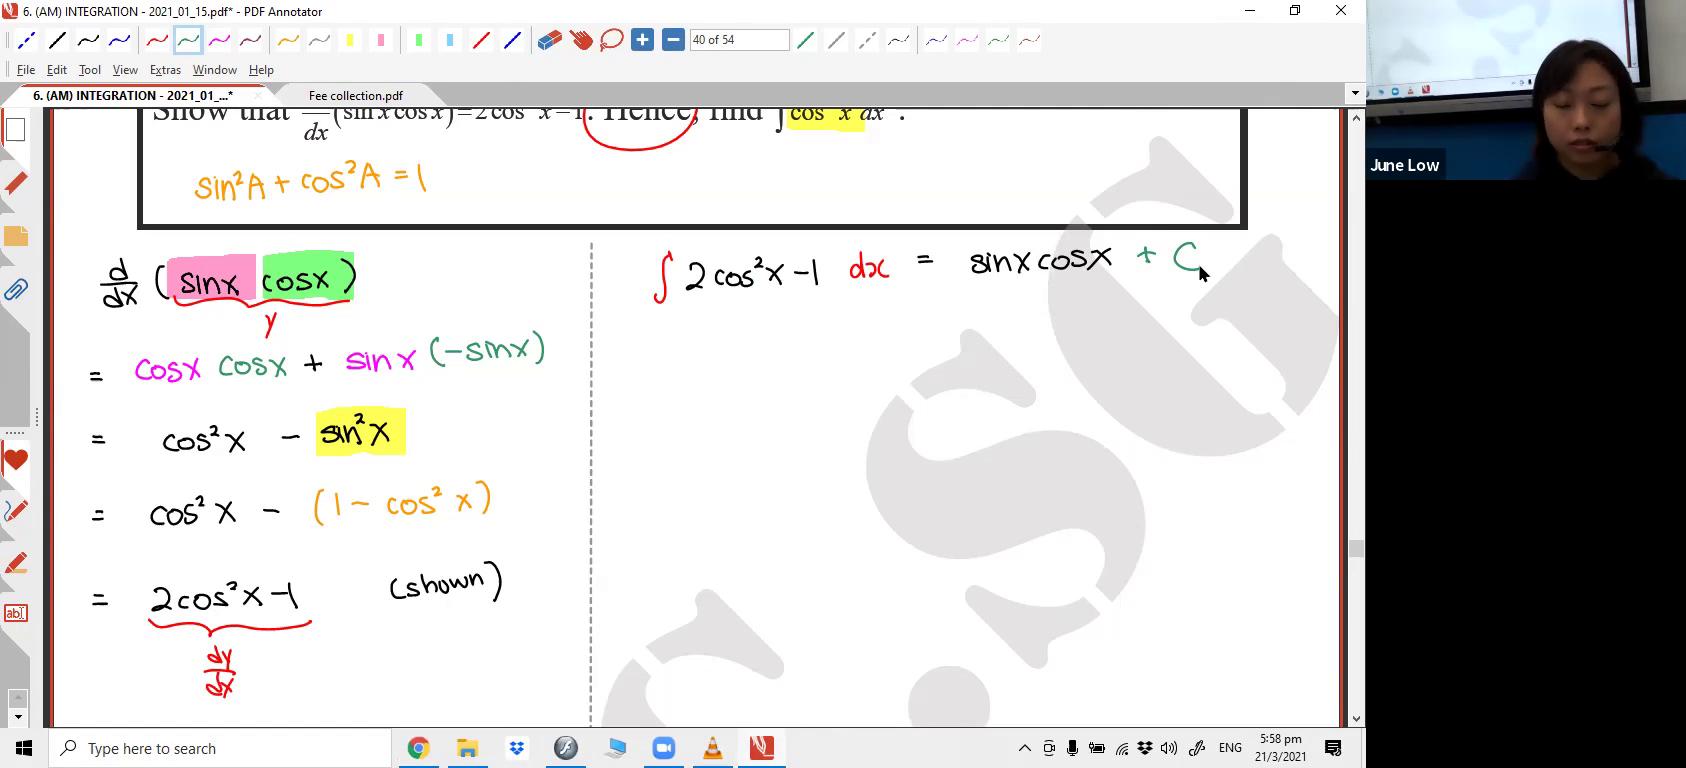 [INTEGRATION] Trigonometric Functions